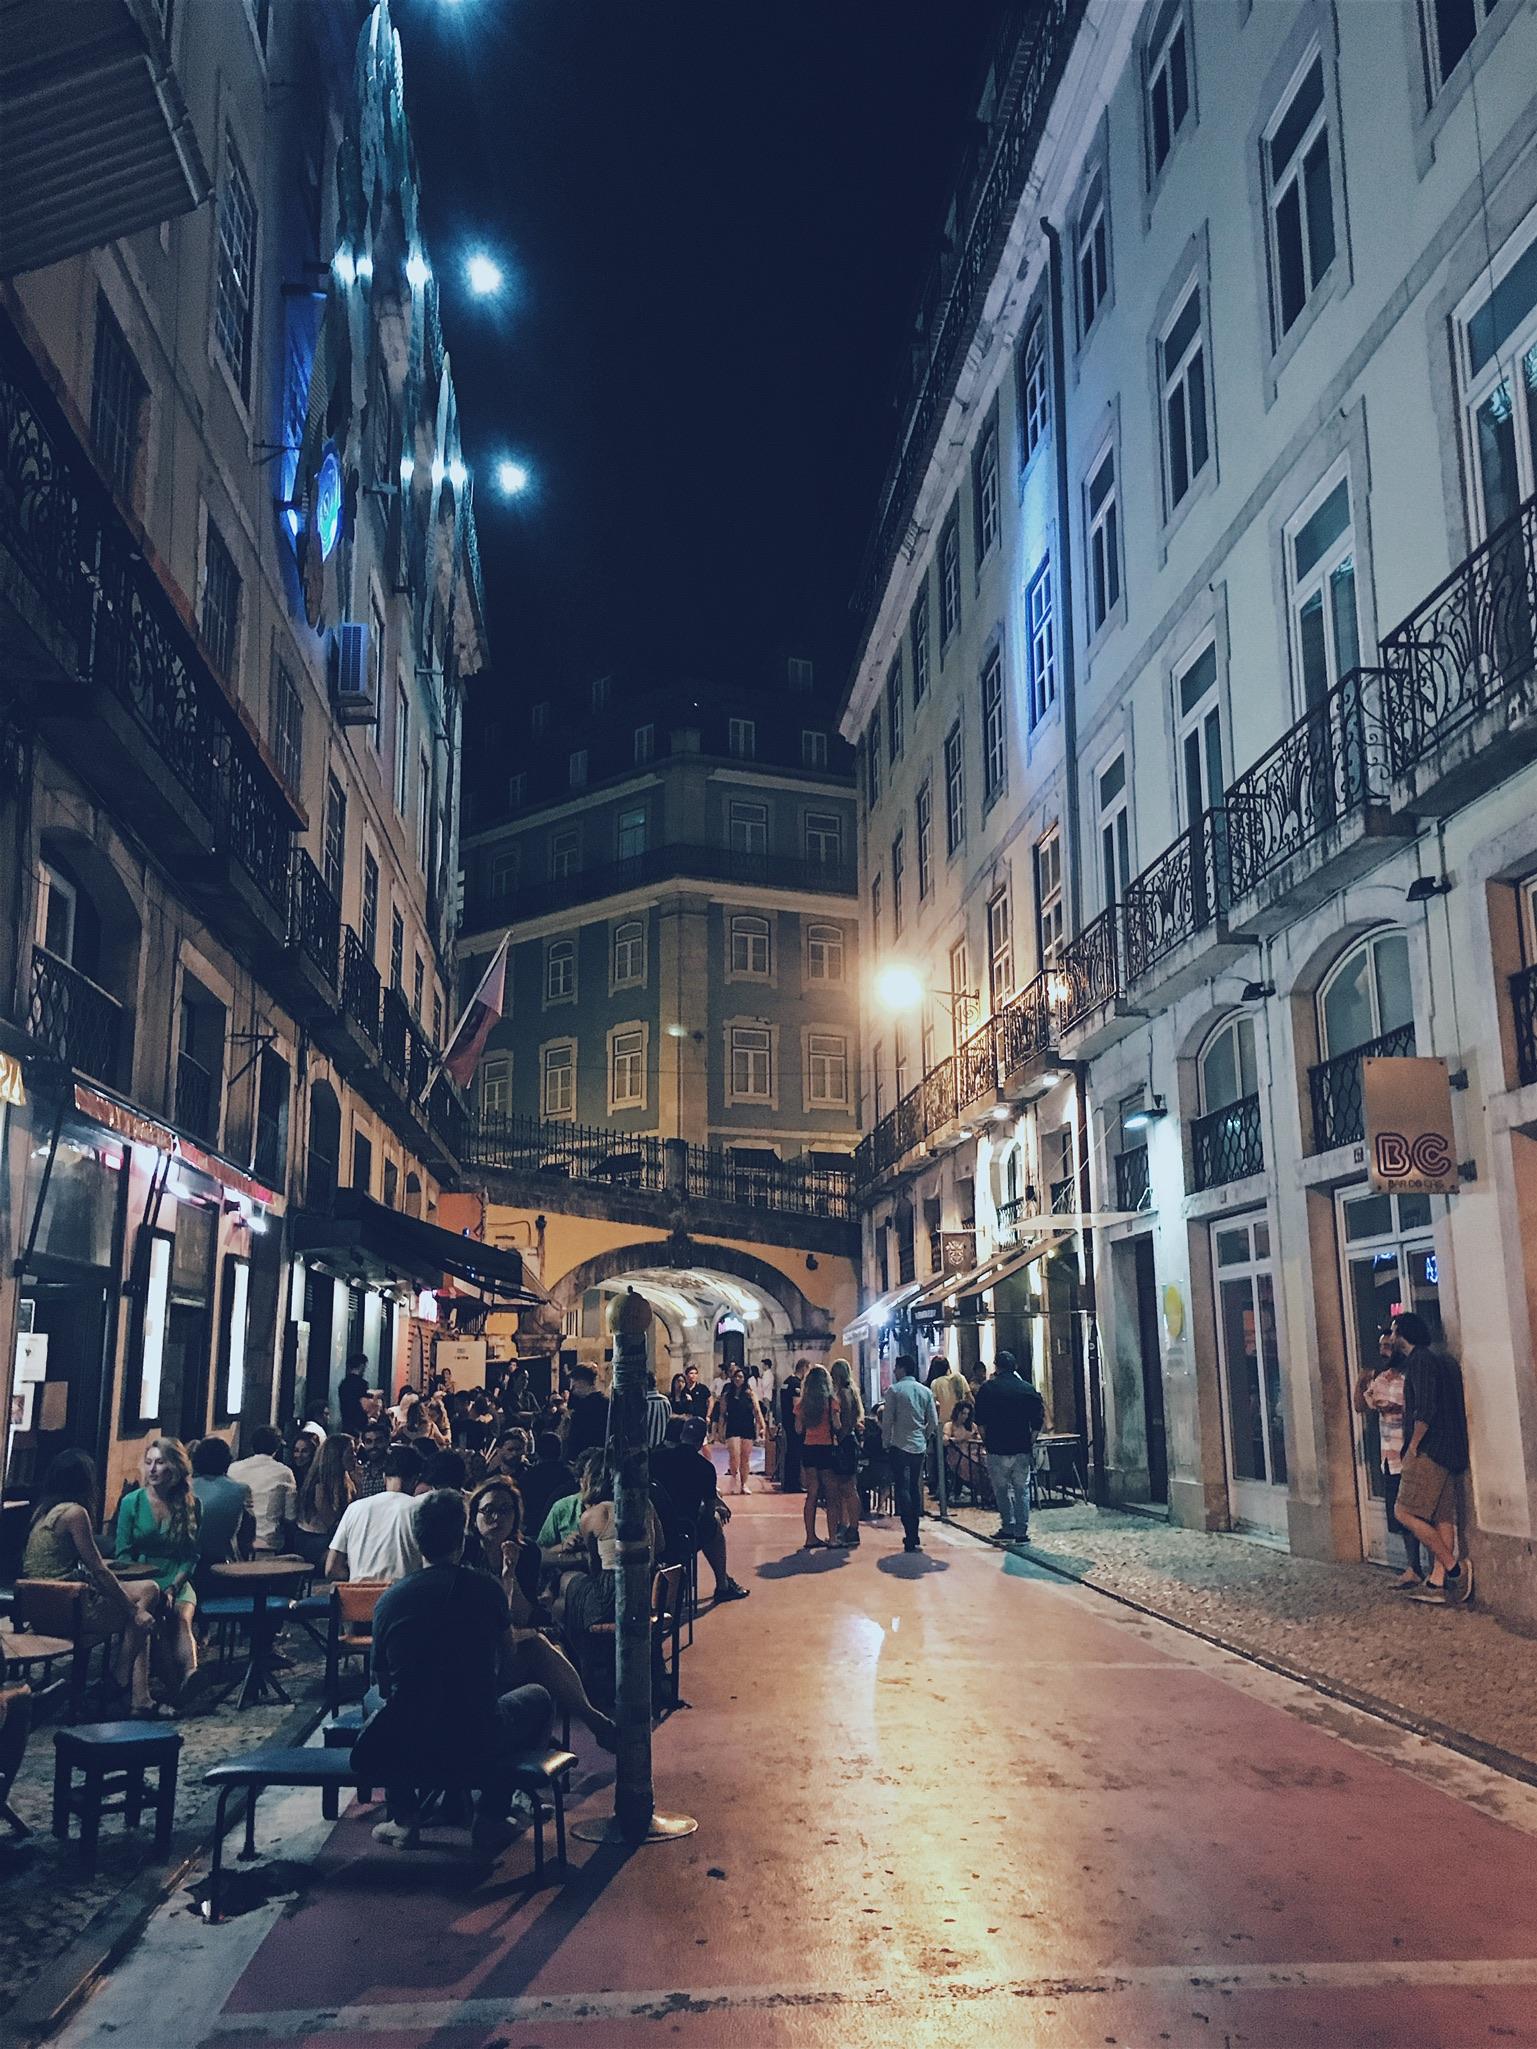 Many bars and lounges along Rua Nova do Carvalho